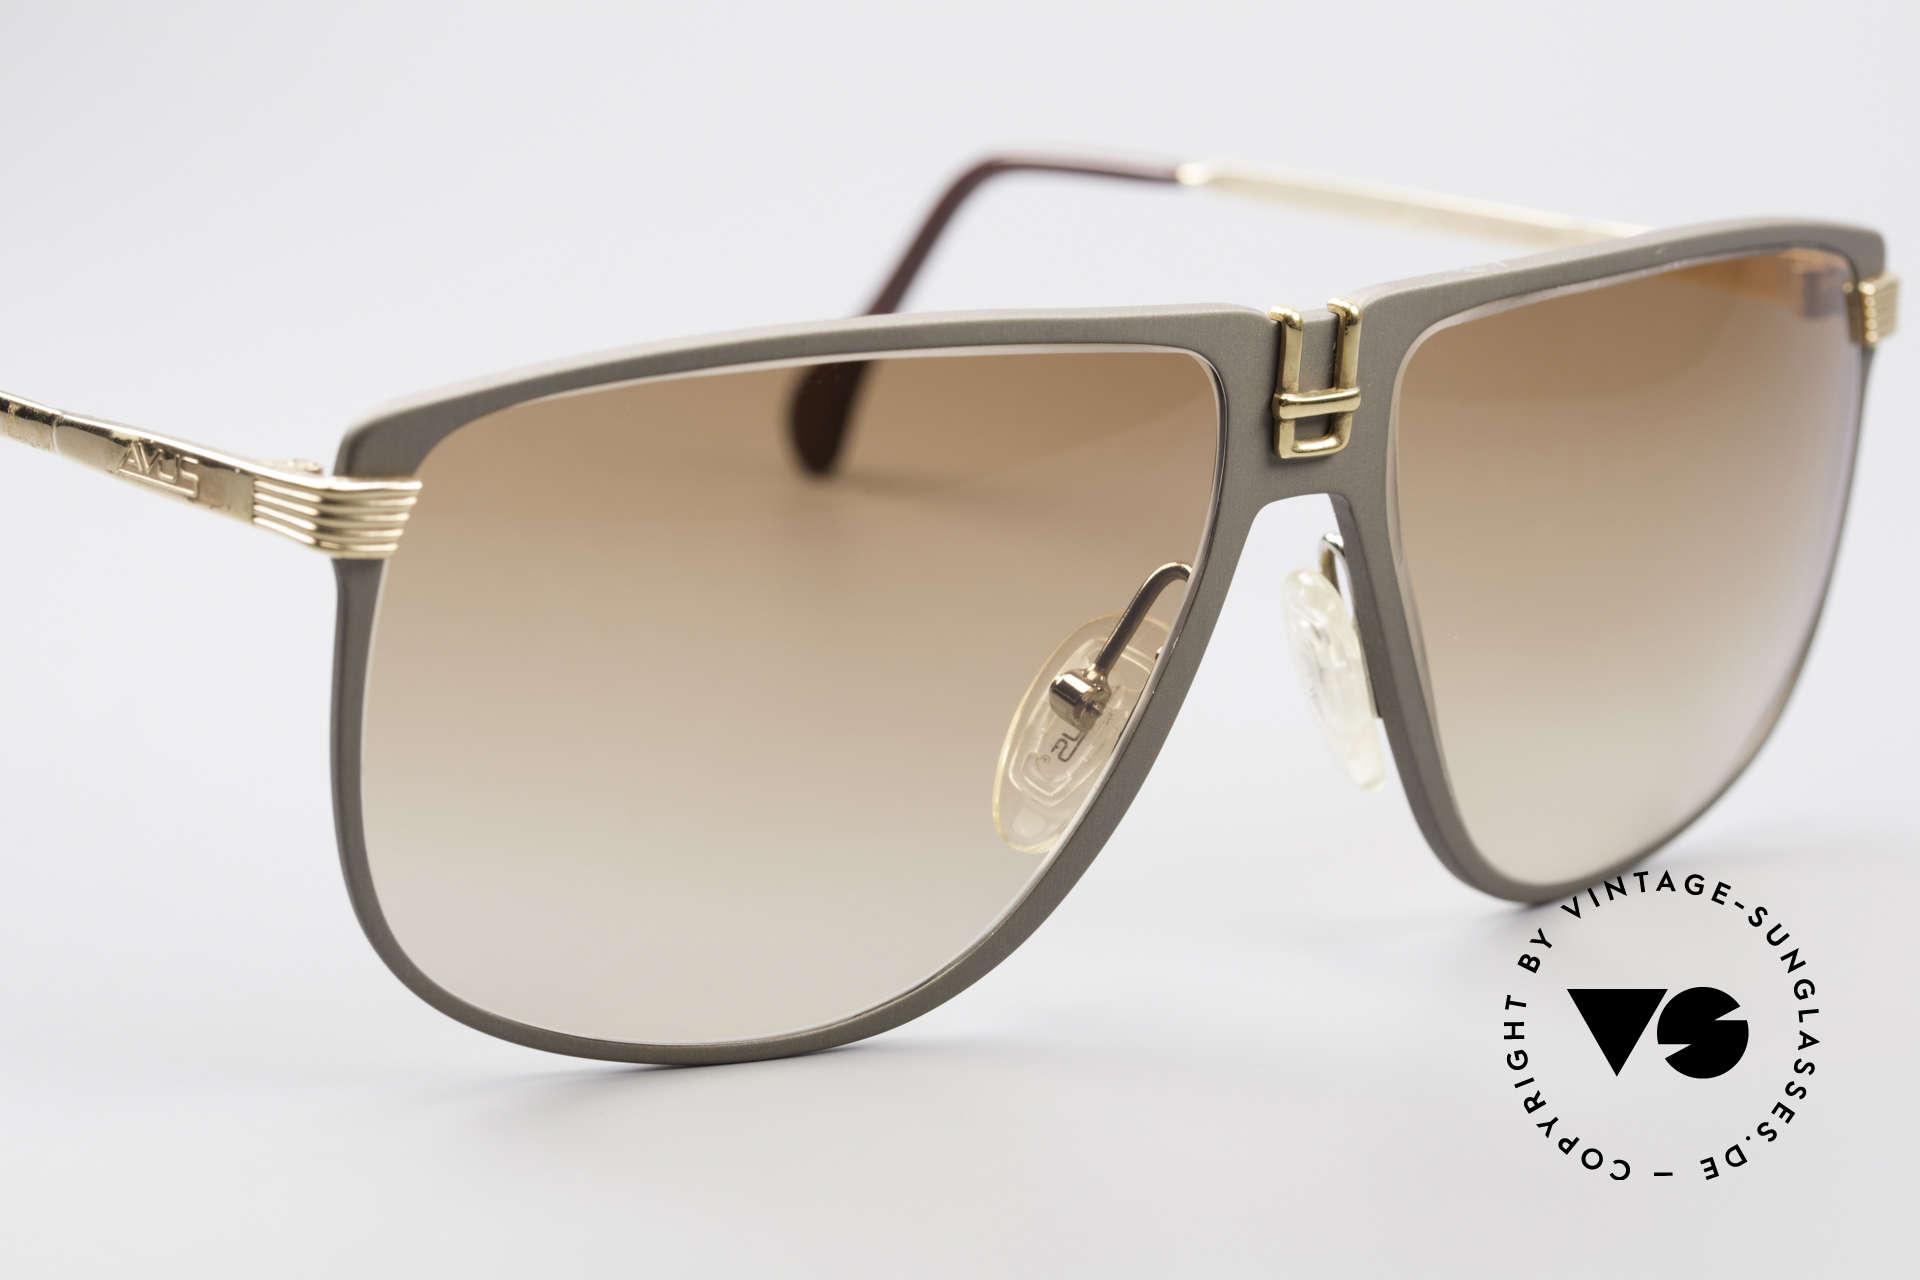 3a7b28174b3 Sonnenbrillen AVUS 210-30 West Germany Sonnenbrille